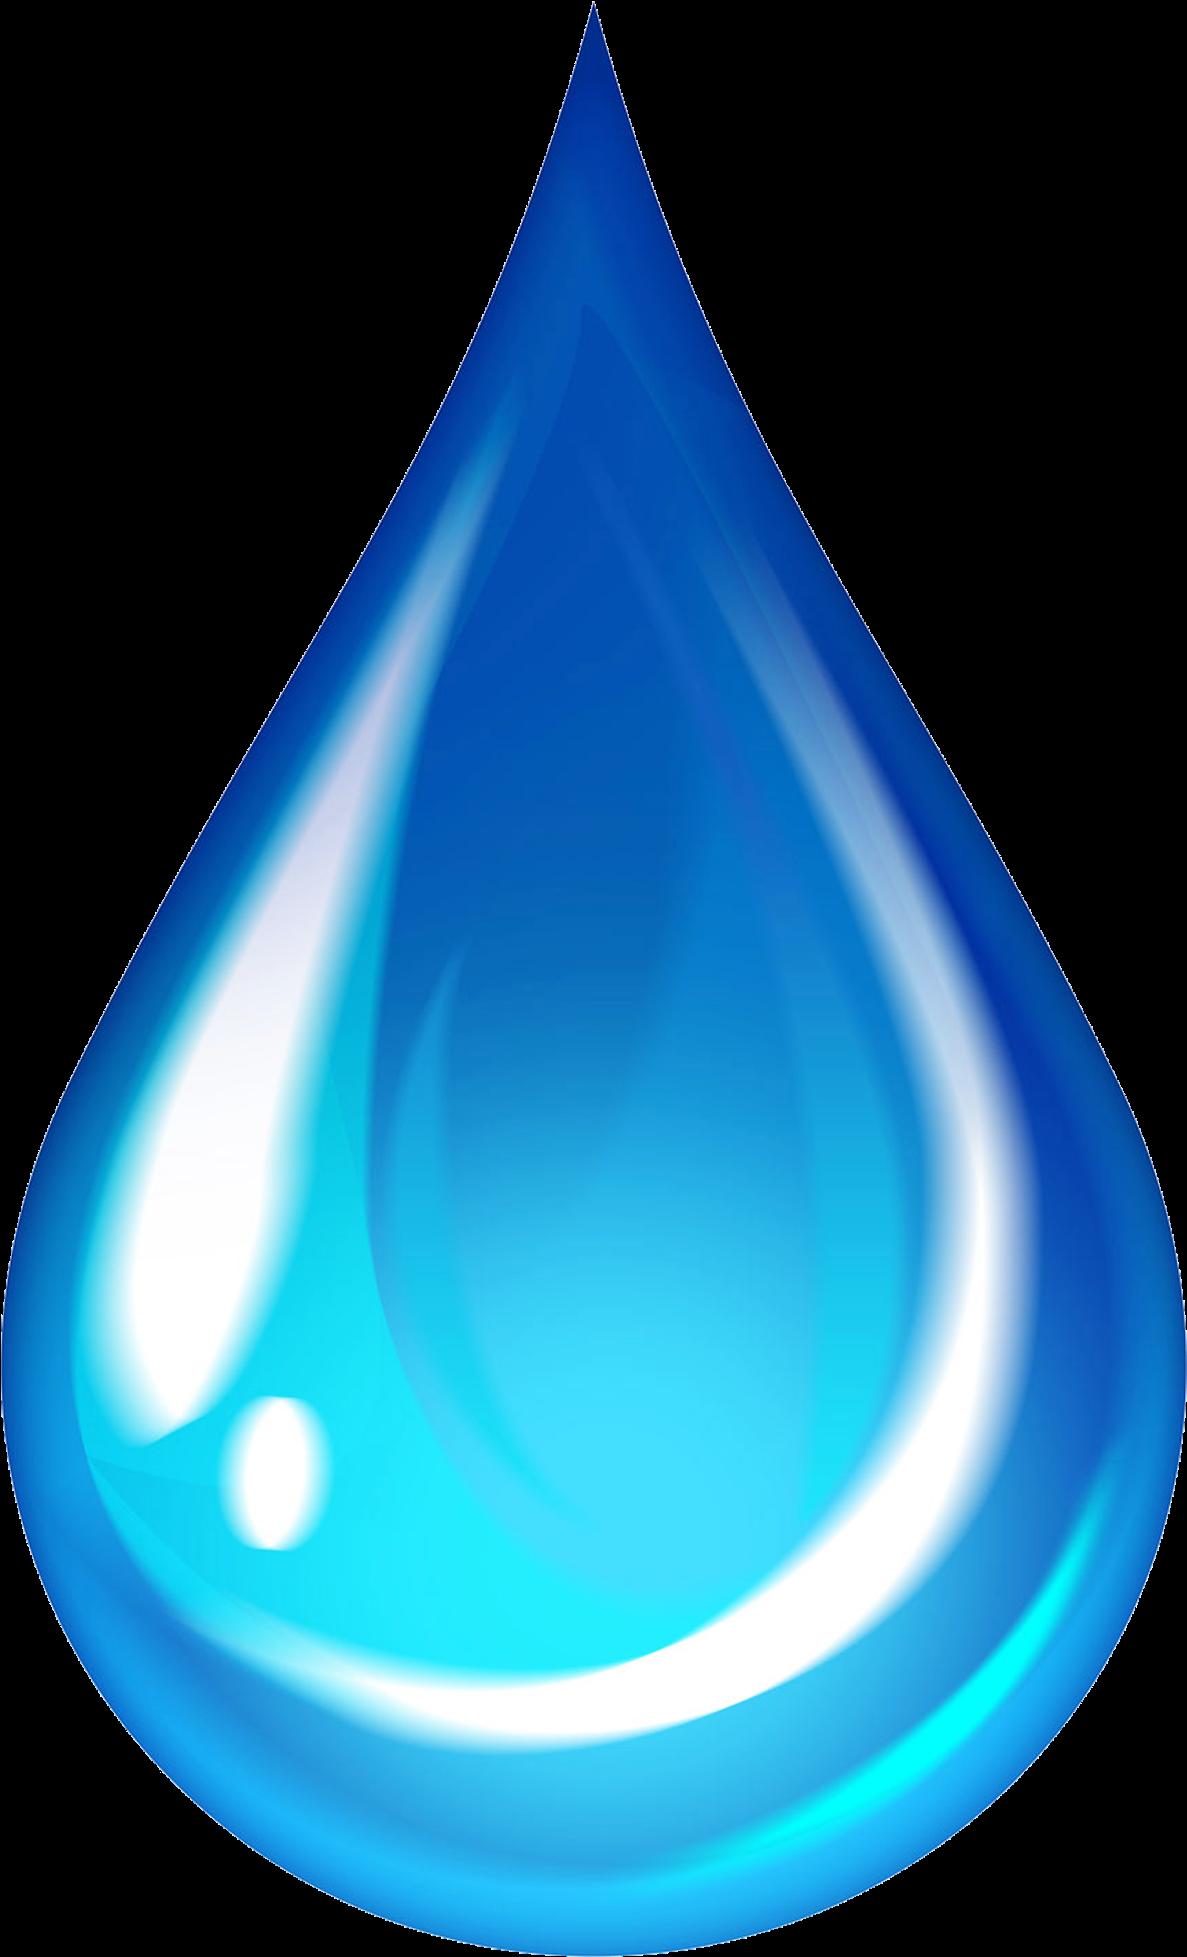 Water Drop Symbol Clipart Best Kmtqp4 Clipart - Water ...